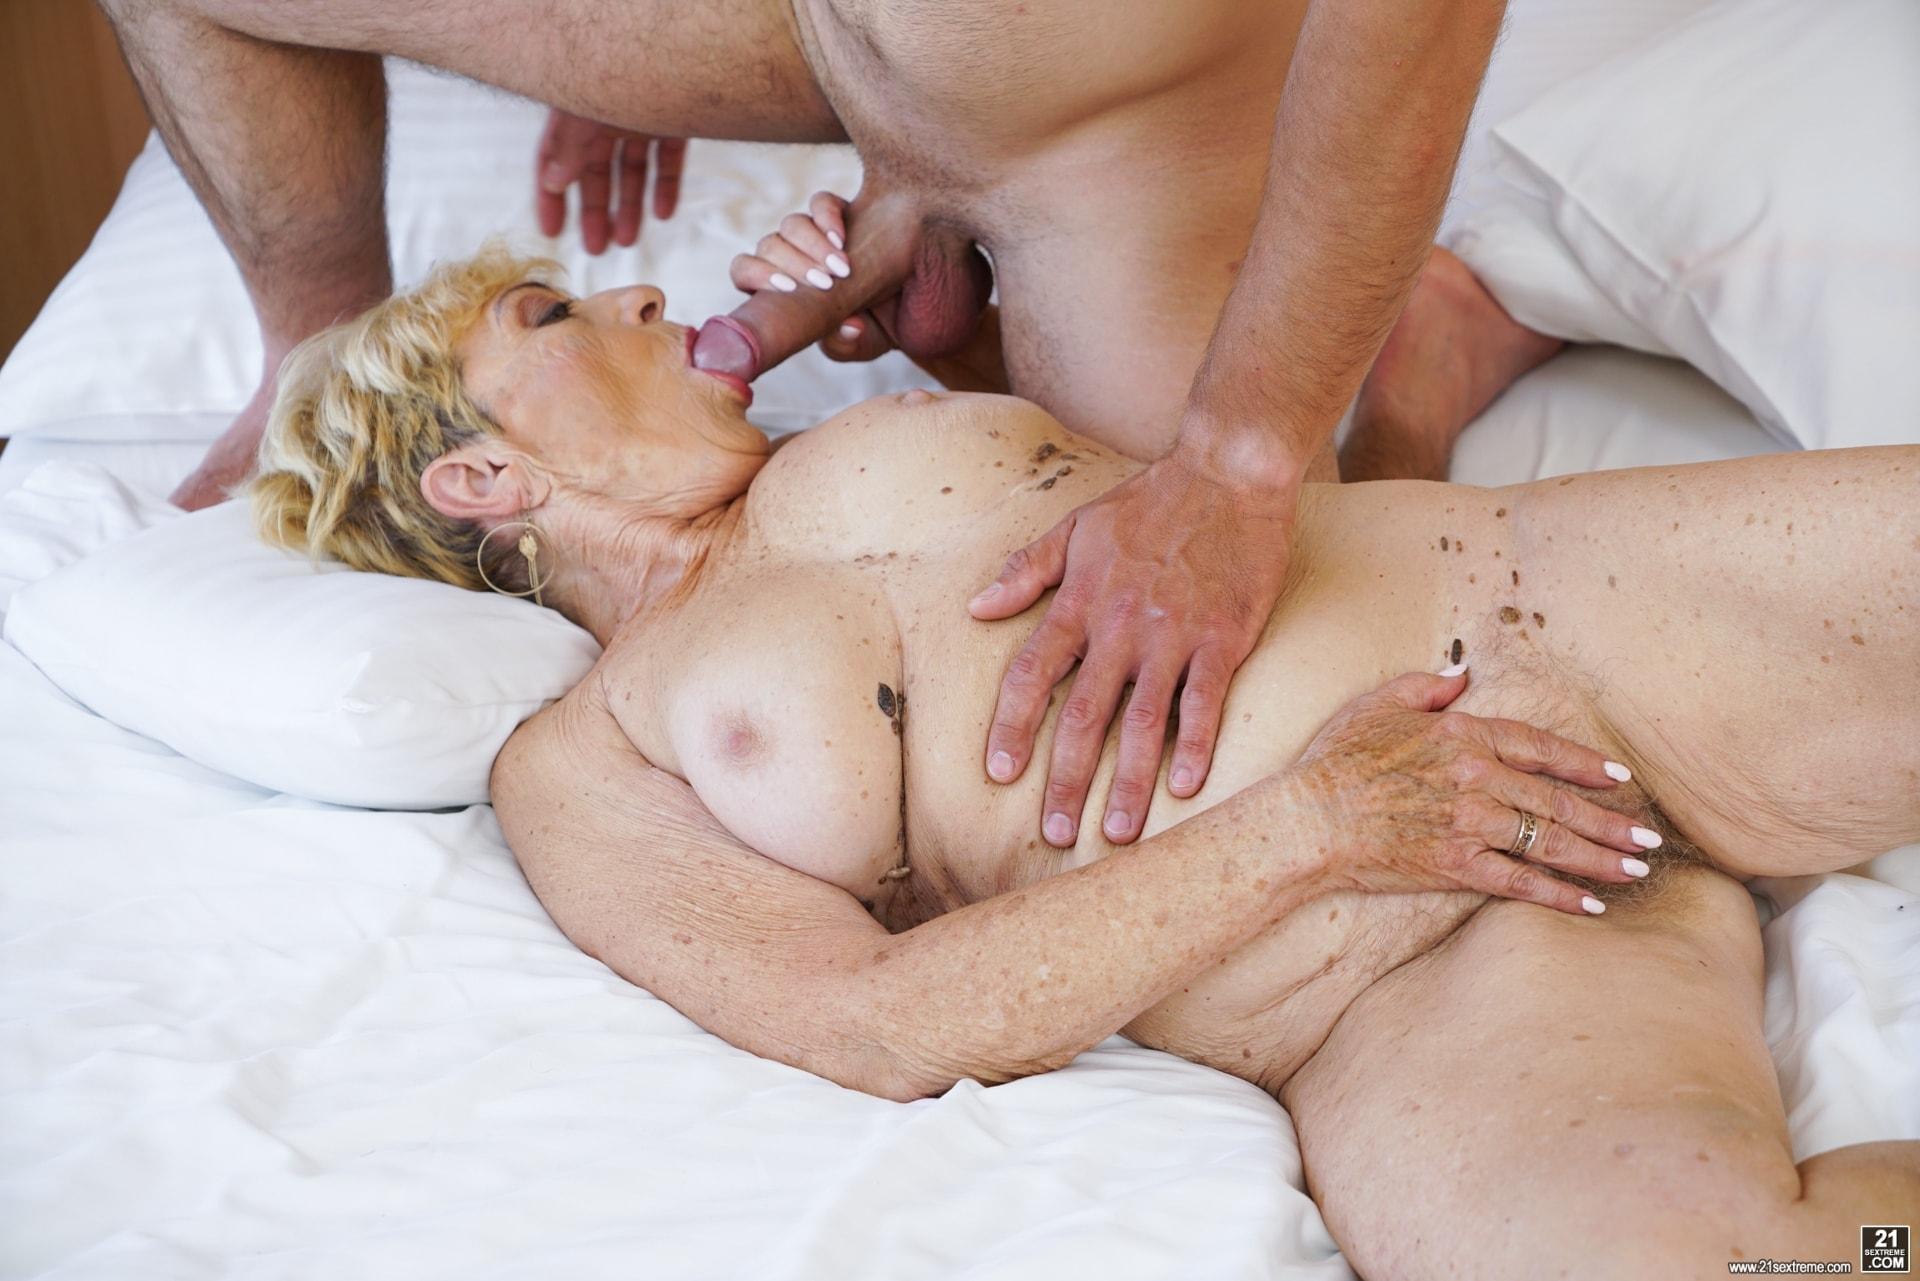 21Sextury 'Old Passion' starring Malya (Photo 54)